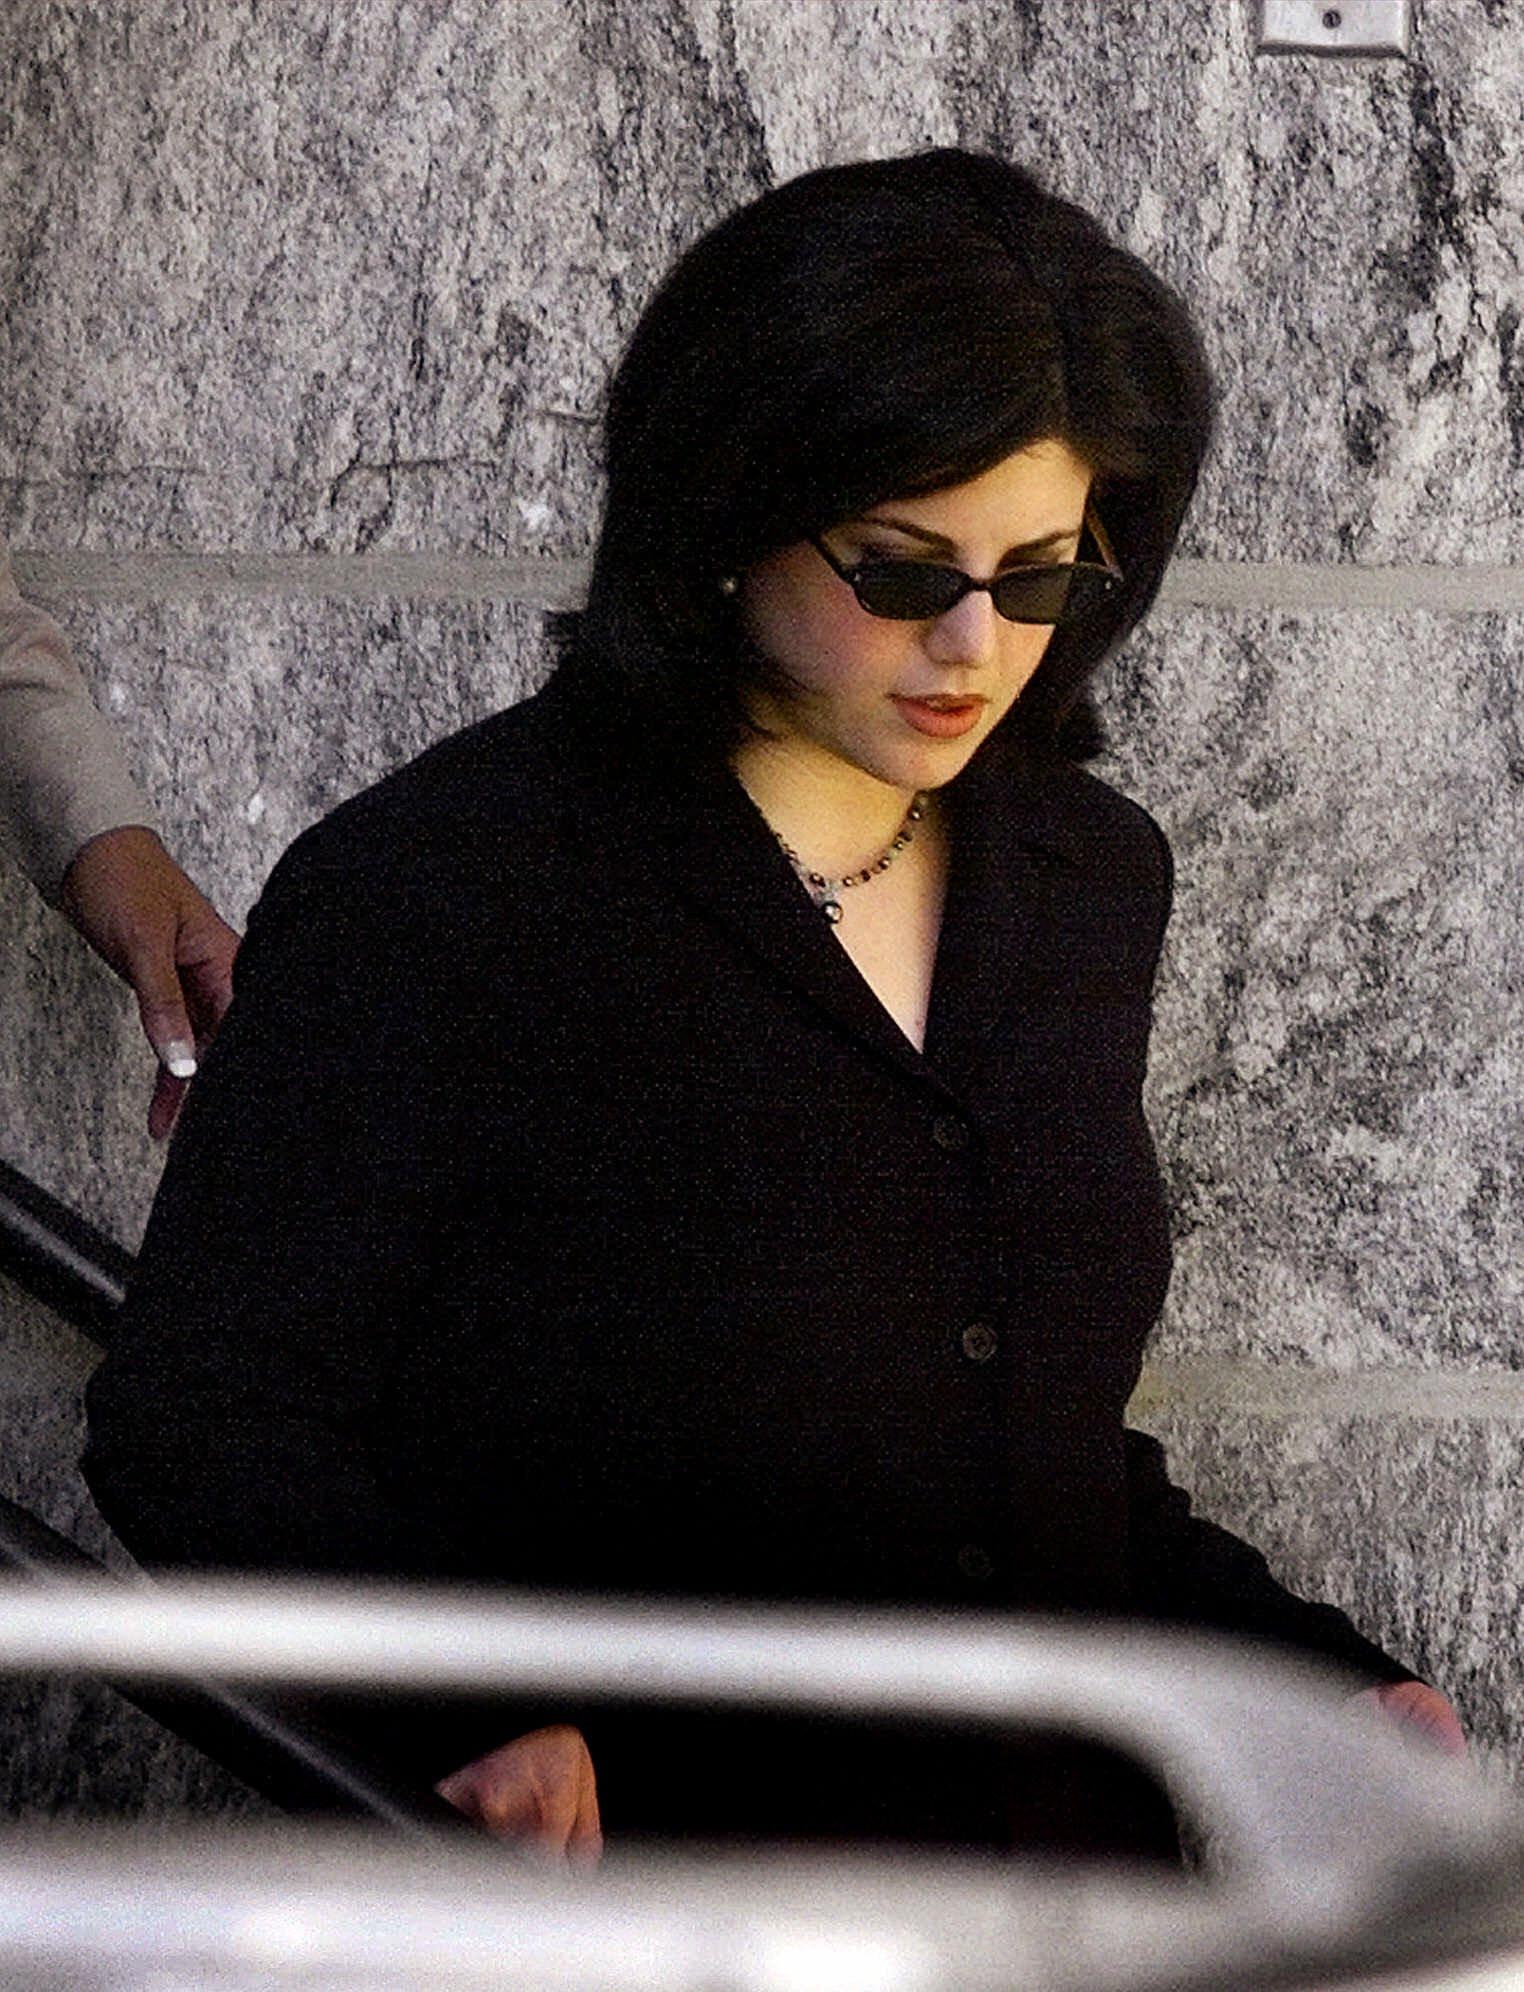 Daily Mail: Αυτό ήταν το τέλος της δυναστείας των Κλίντον – Όλα τα σκάνδαλα μιας «βρώμικης» οικογένειας - Εικόνα8